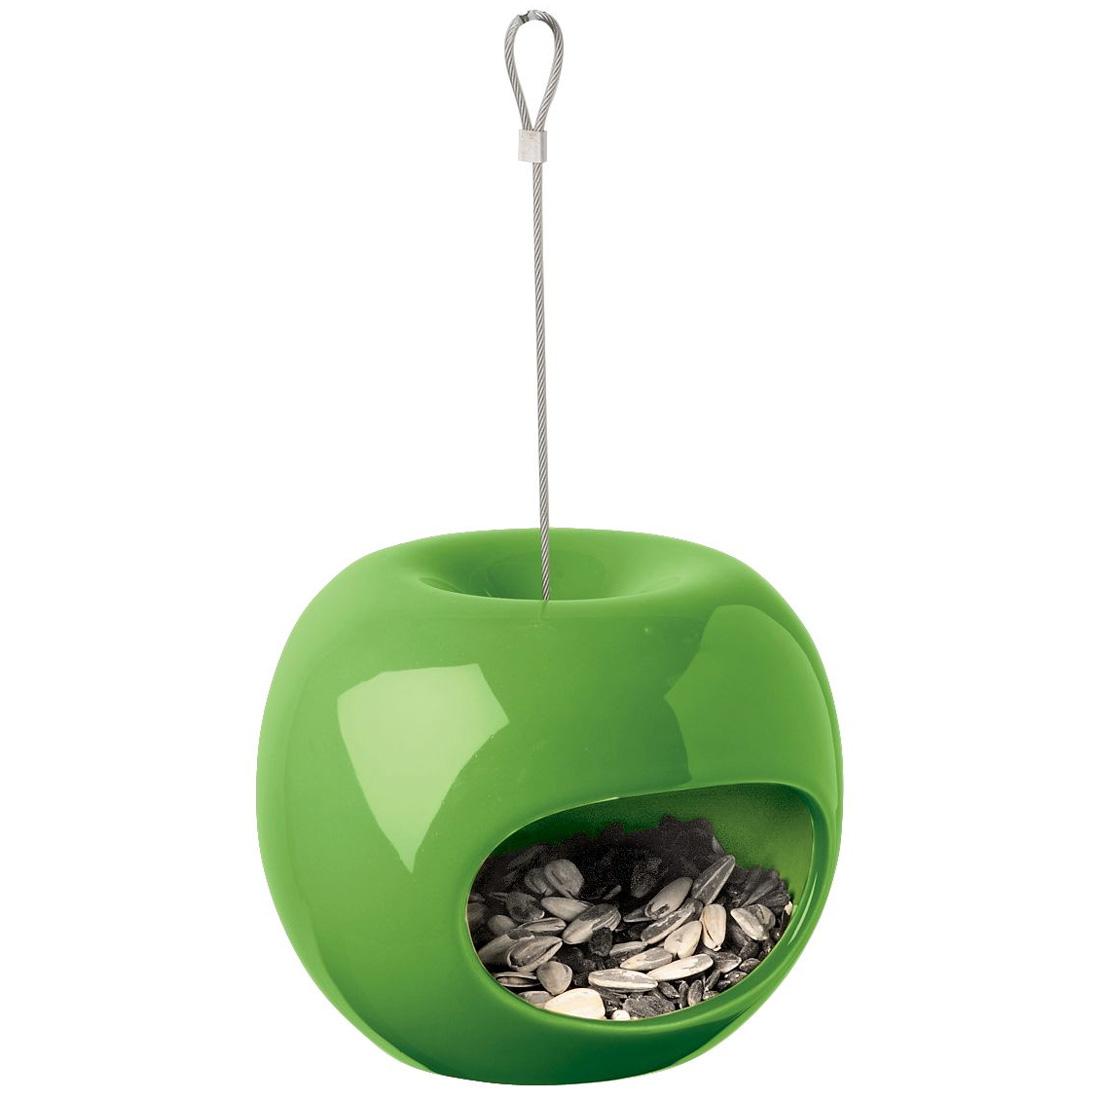 Apple Bird Feeders The Green Head